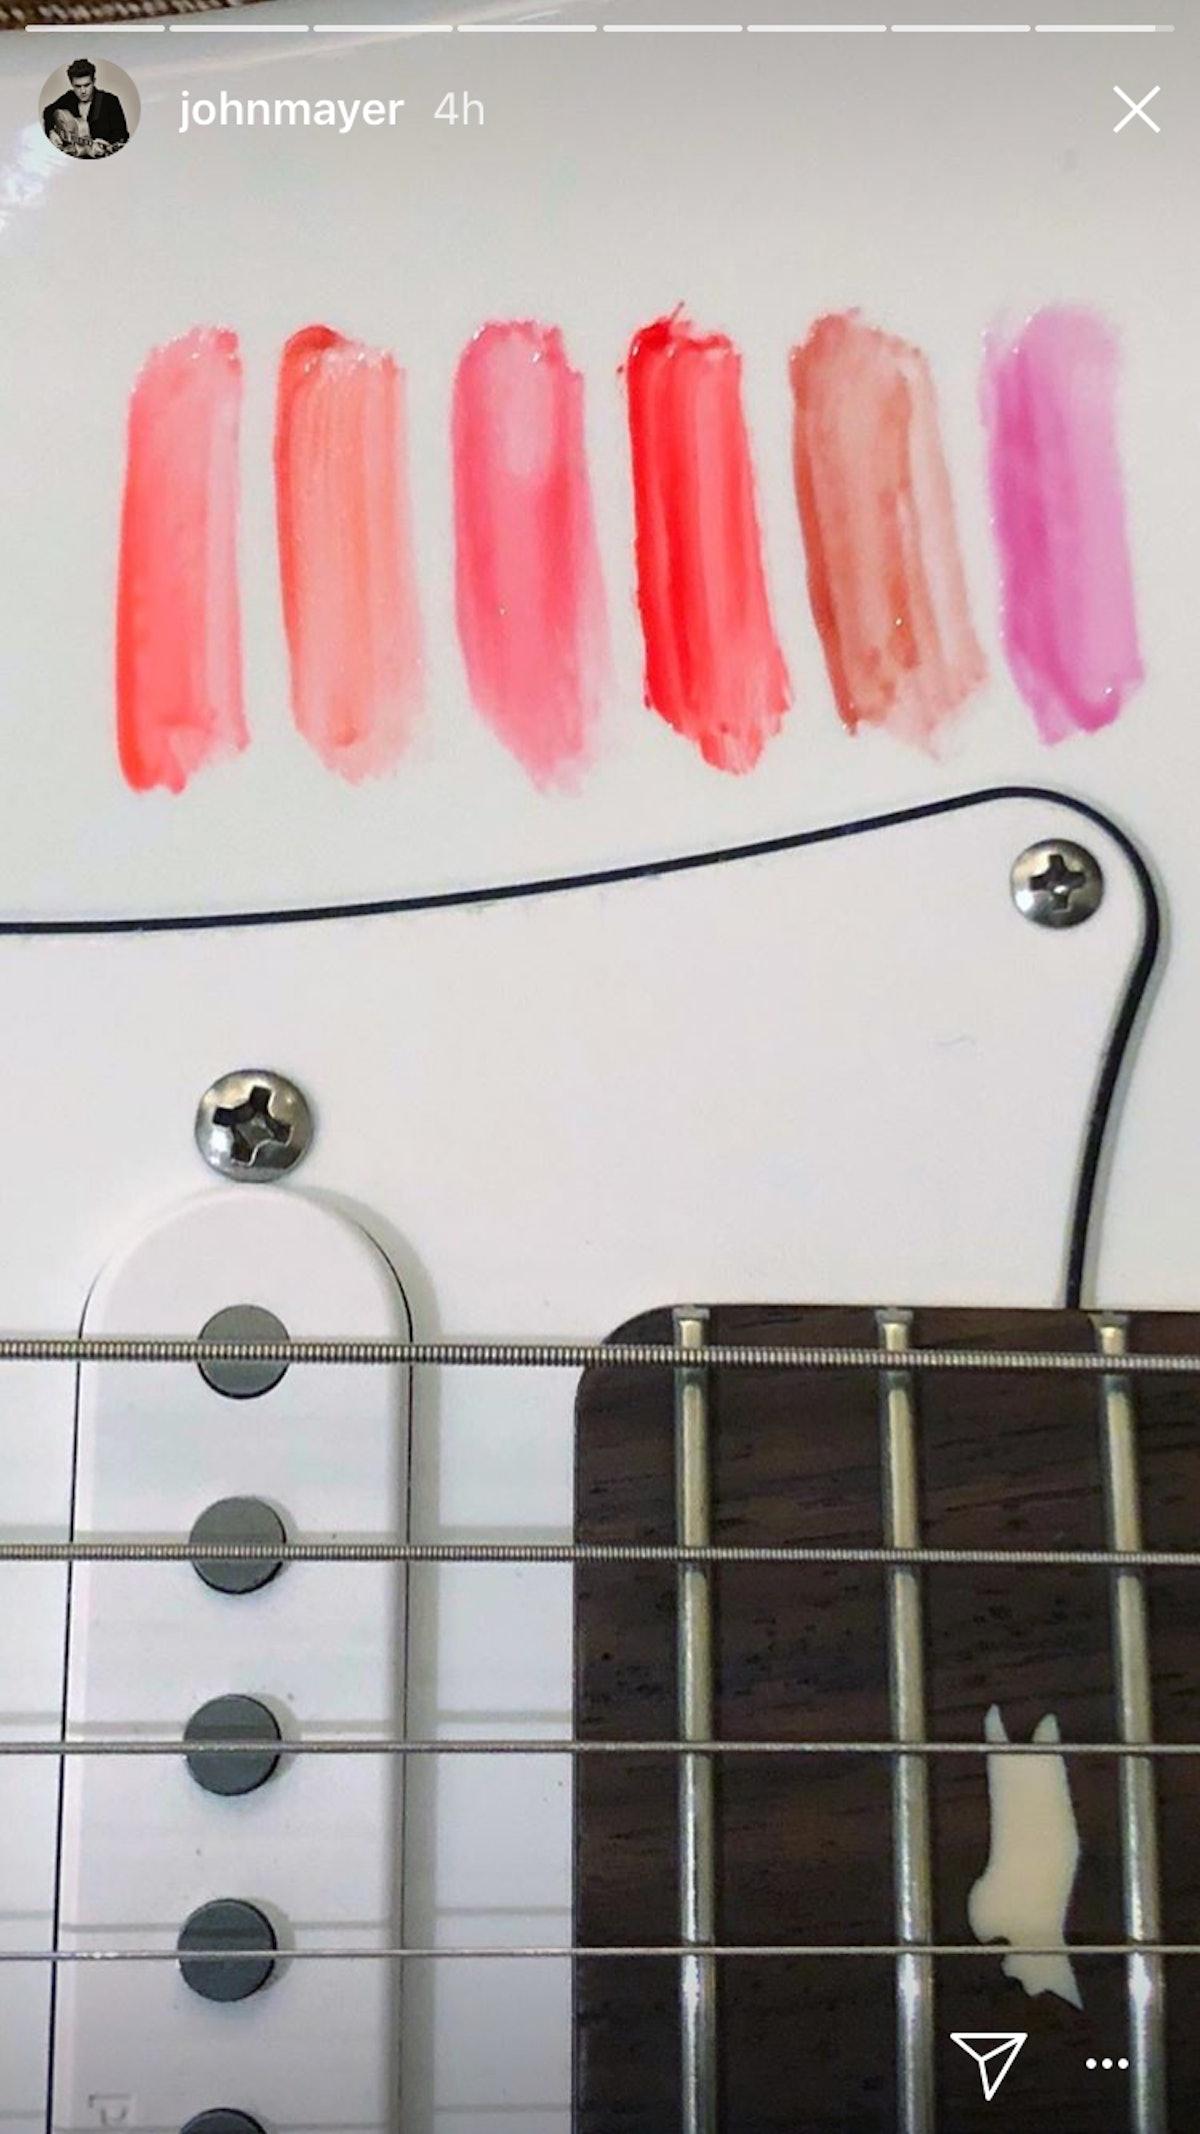 john-mayer-chanel-guitar.PNG